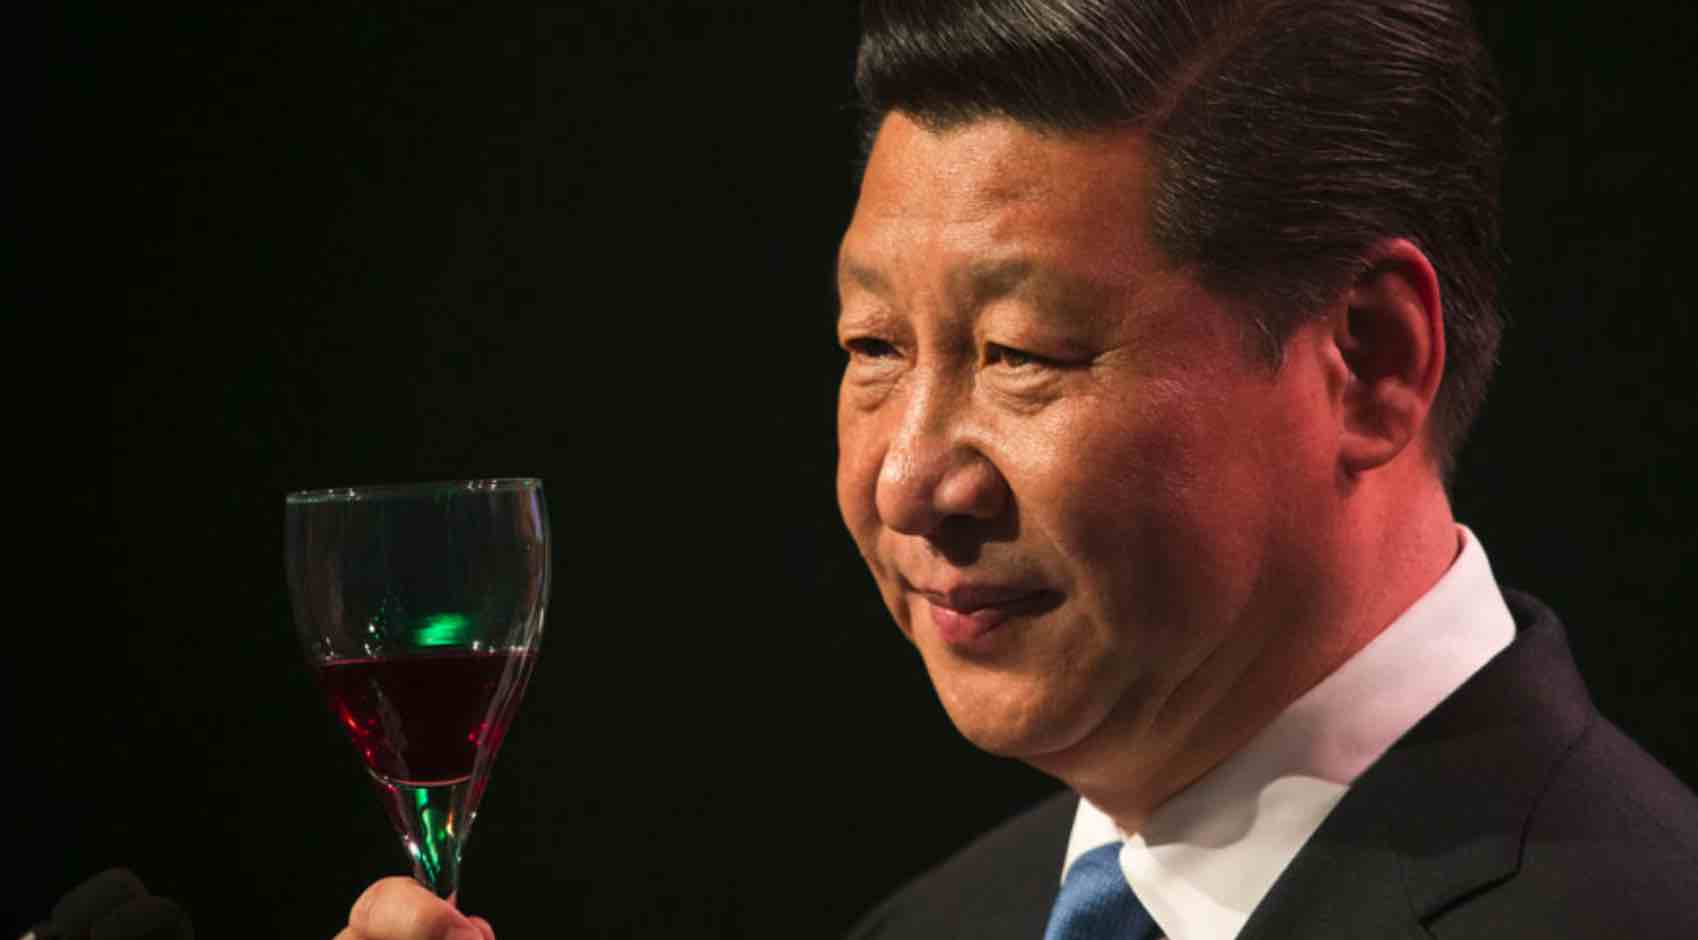 Xi Jinping, China, Coronavirus chino, Propaganda china, Estrategia china, Geopolítica